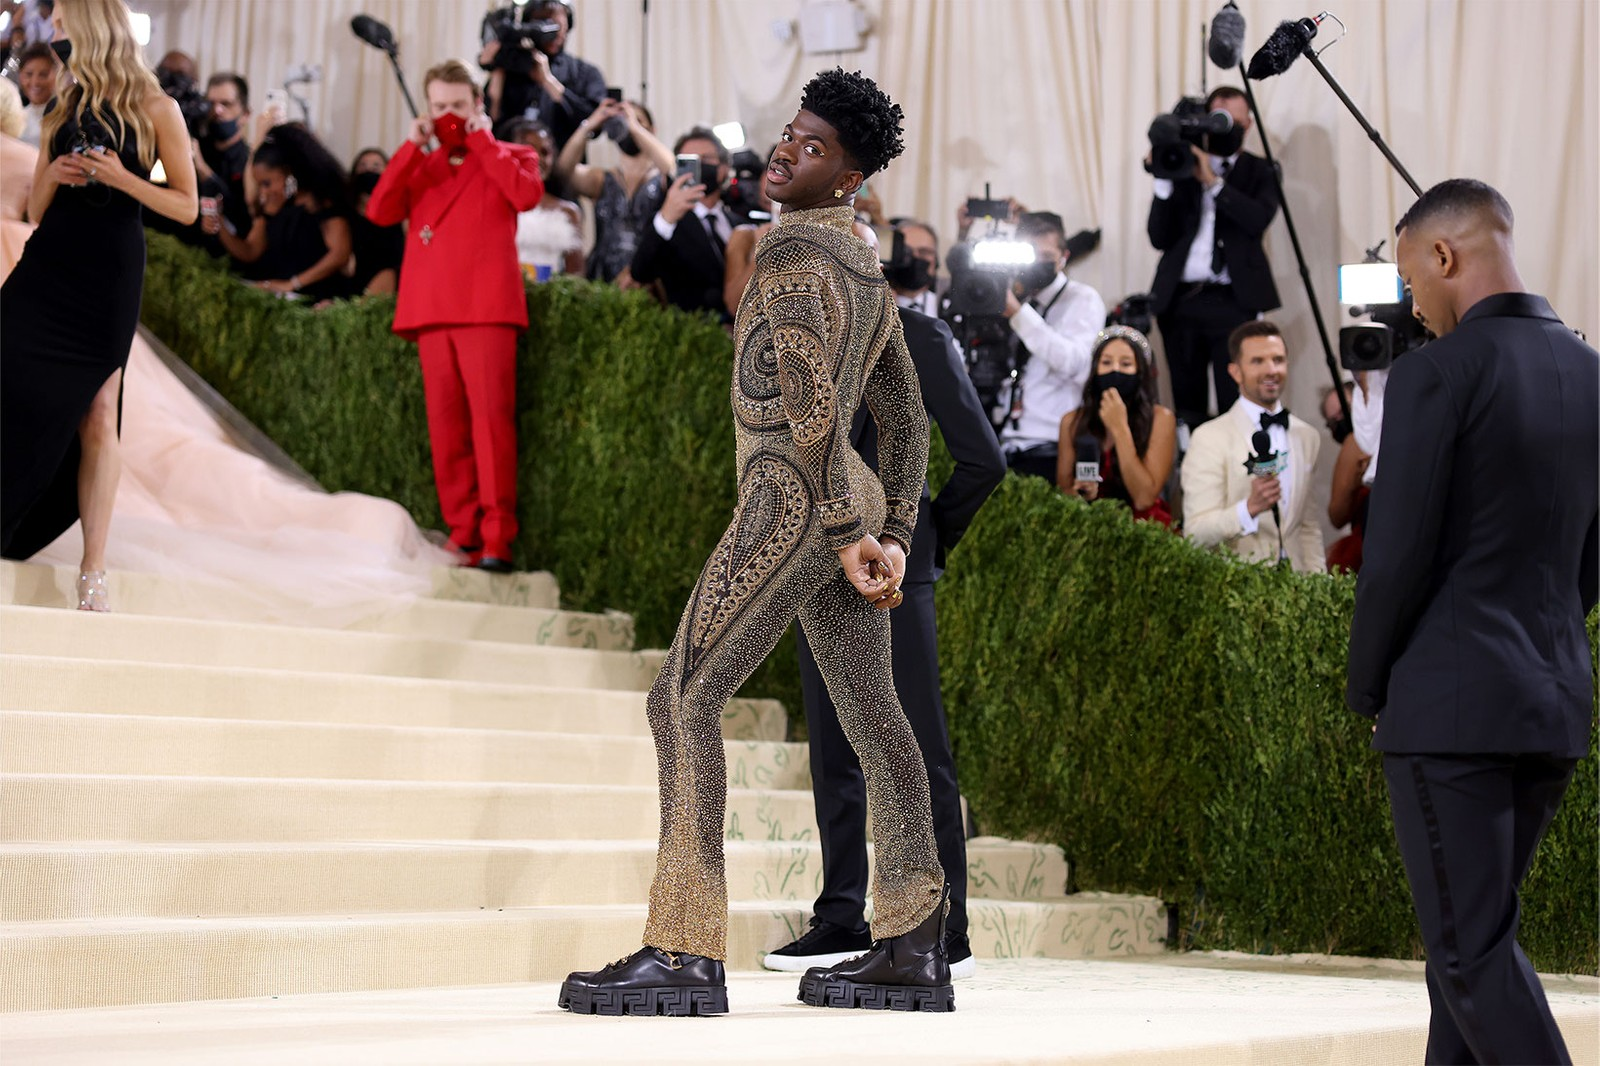 Met Gala Debut First-Ever Red Carpet Looks Celebrities Influencers BLACKPINK Rose Emma Chamberlain Megan Thee Stallion